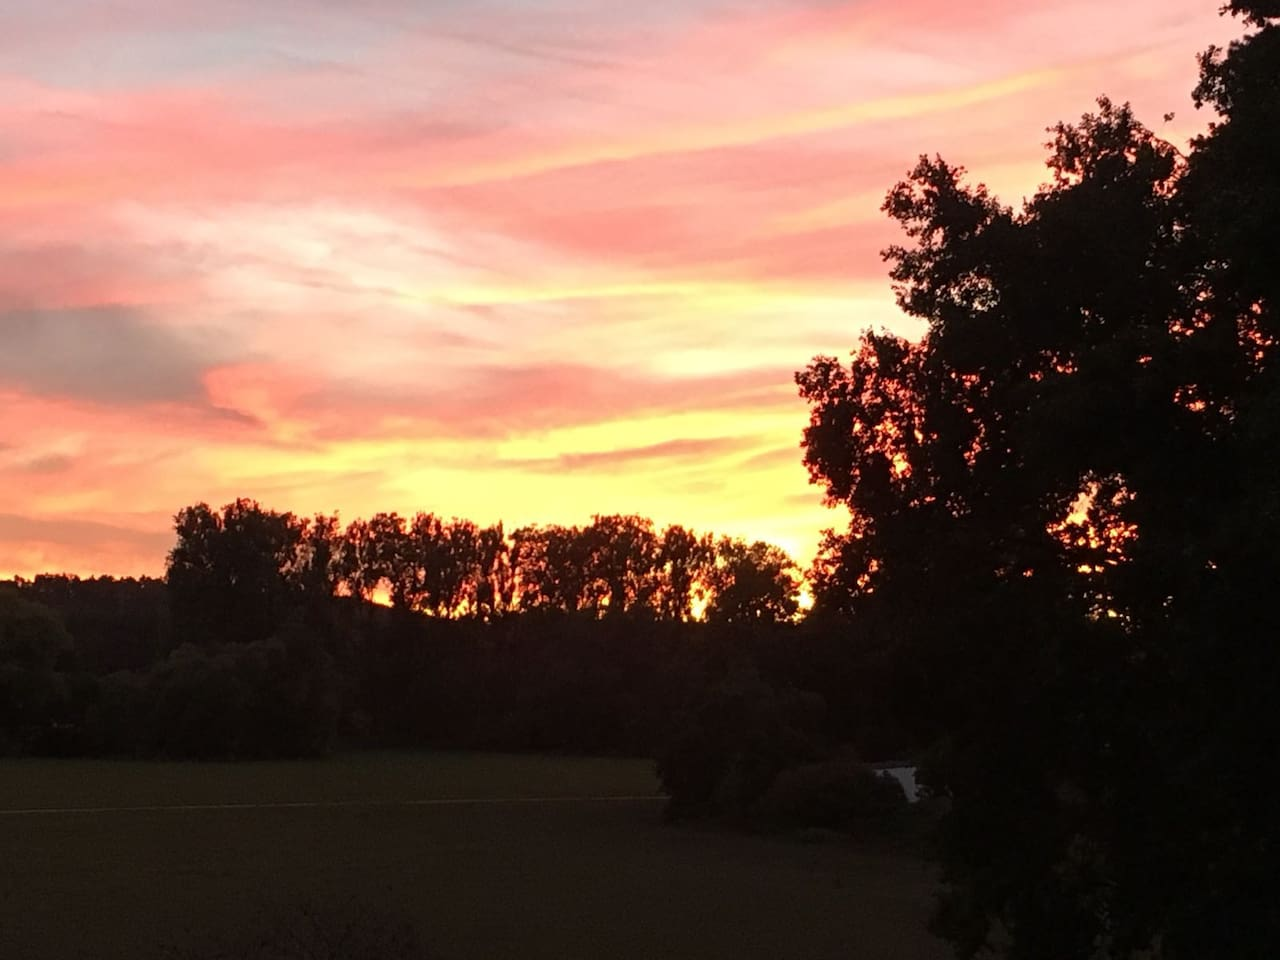 Sonnenuntergang am Waldesrand